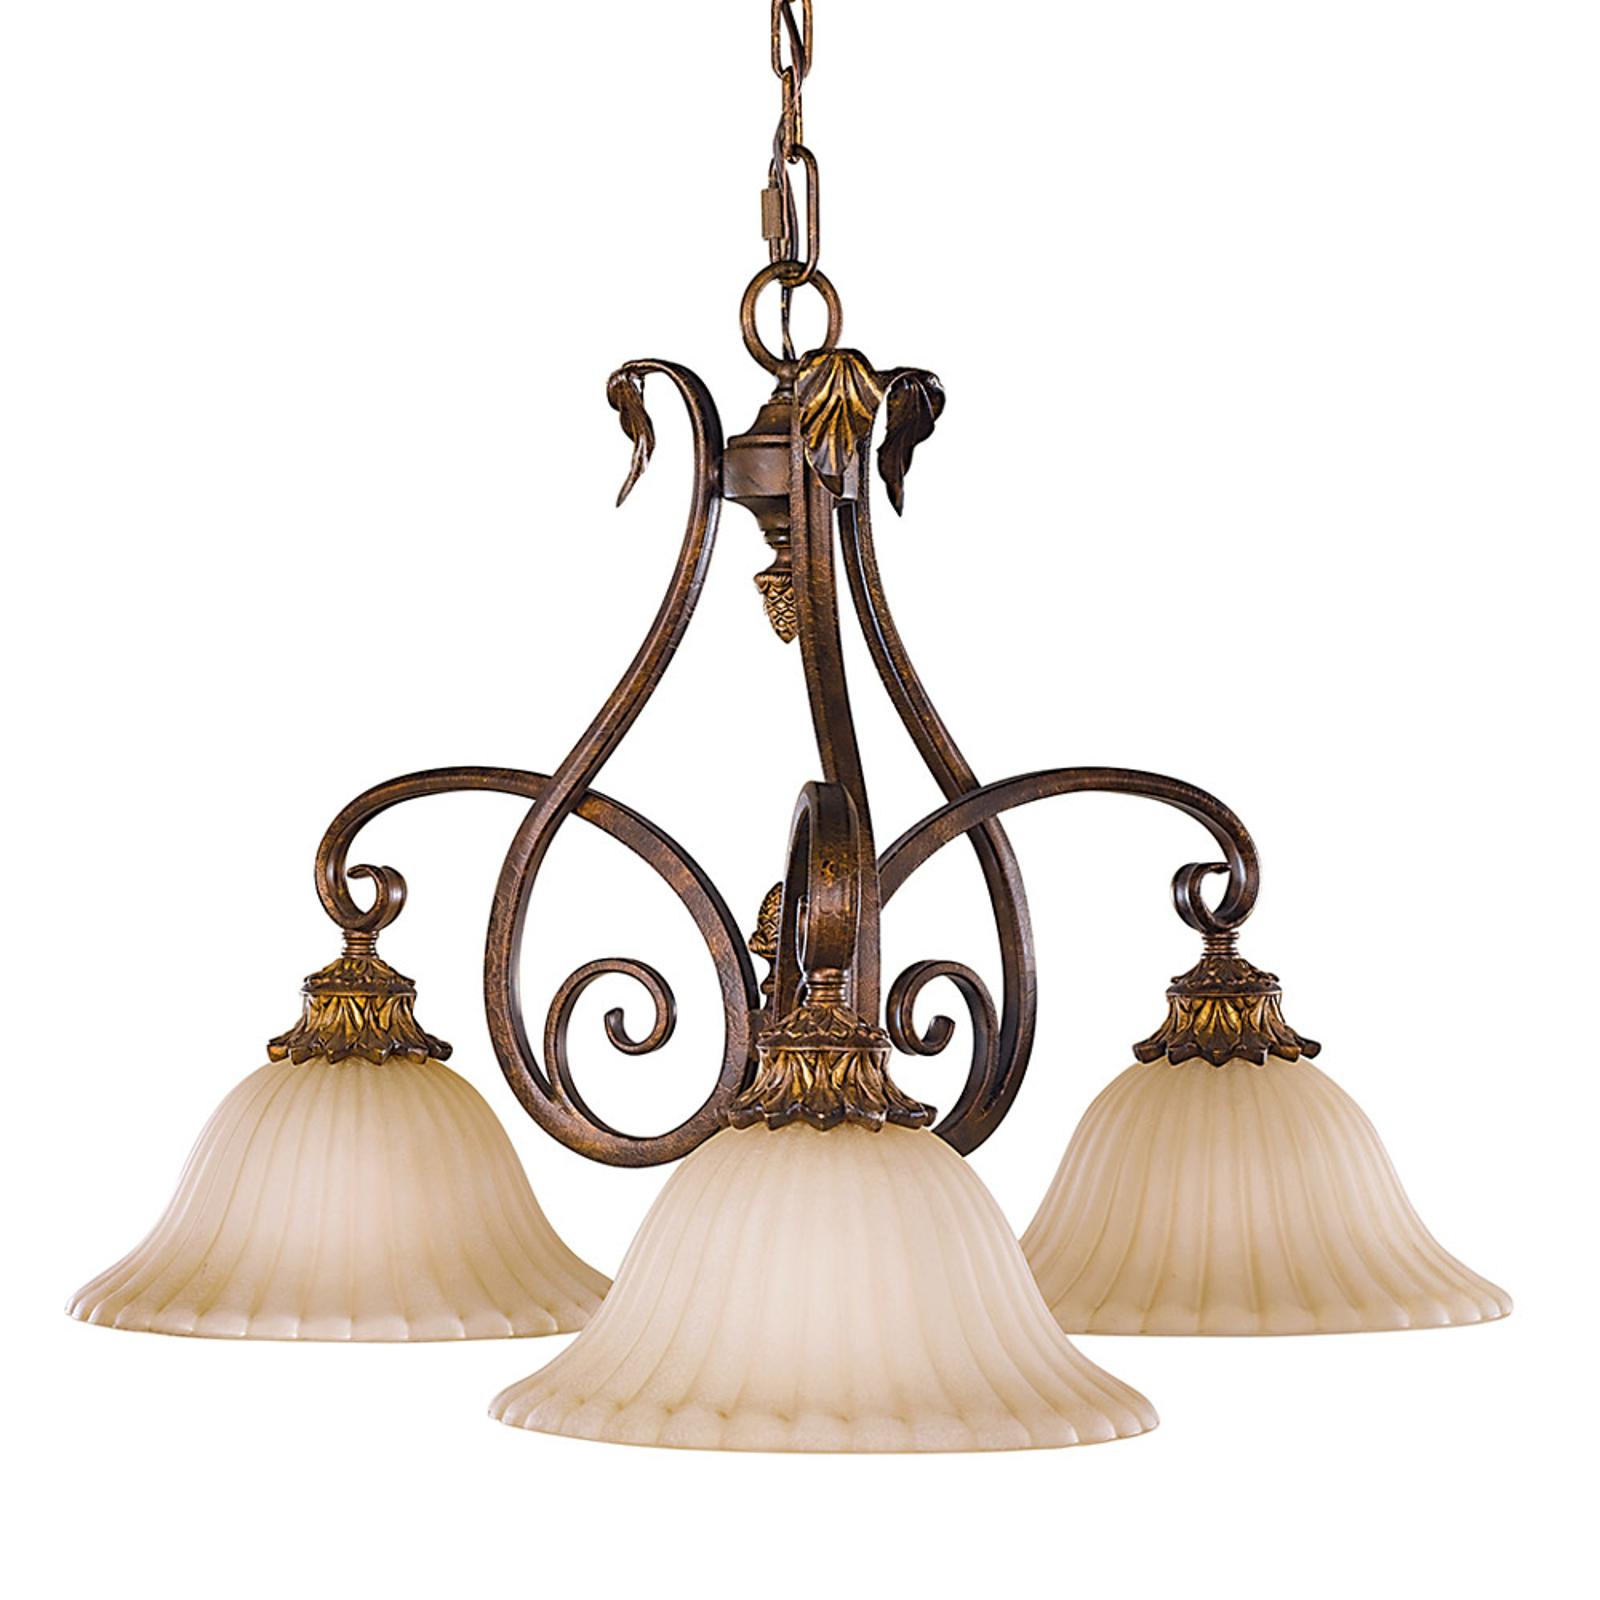 Sonoma Valley hængelampe, 3 lyskilder